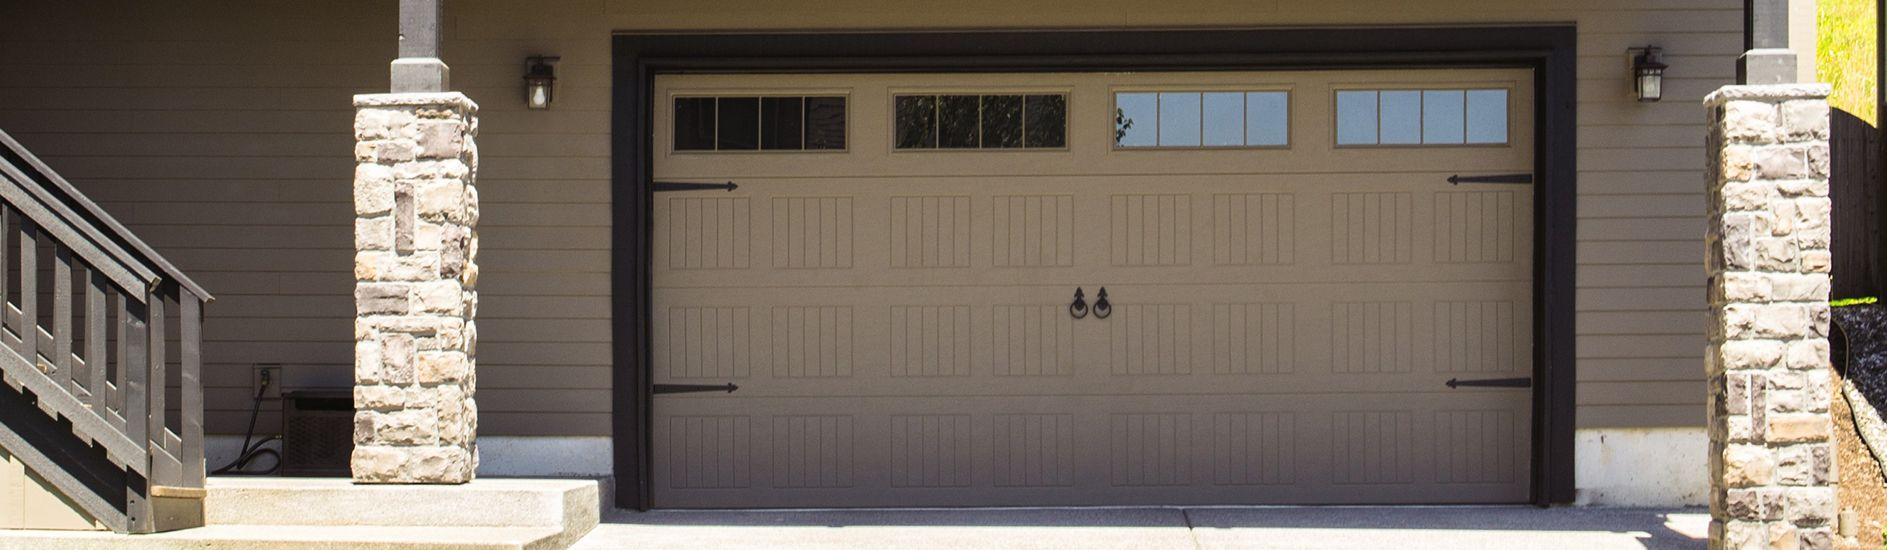 hight resolution of 9100 9600 steel garage door sonoma taupe stockbridge